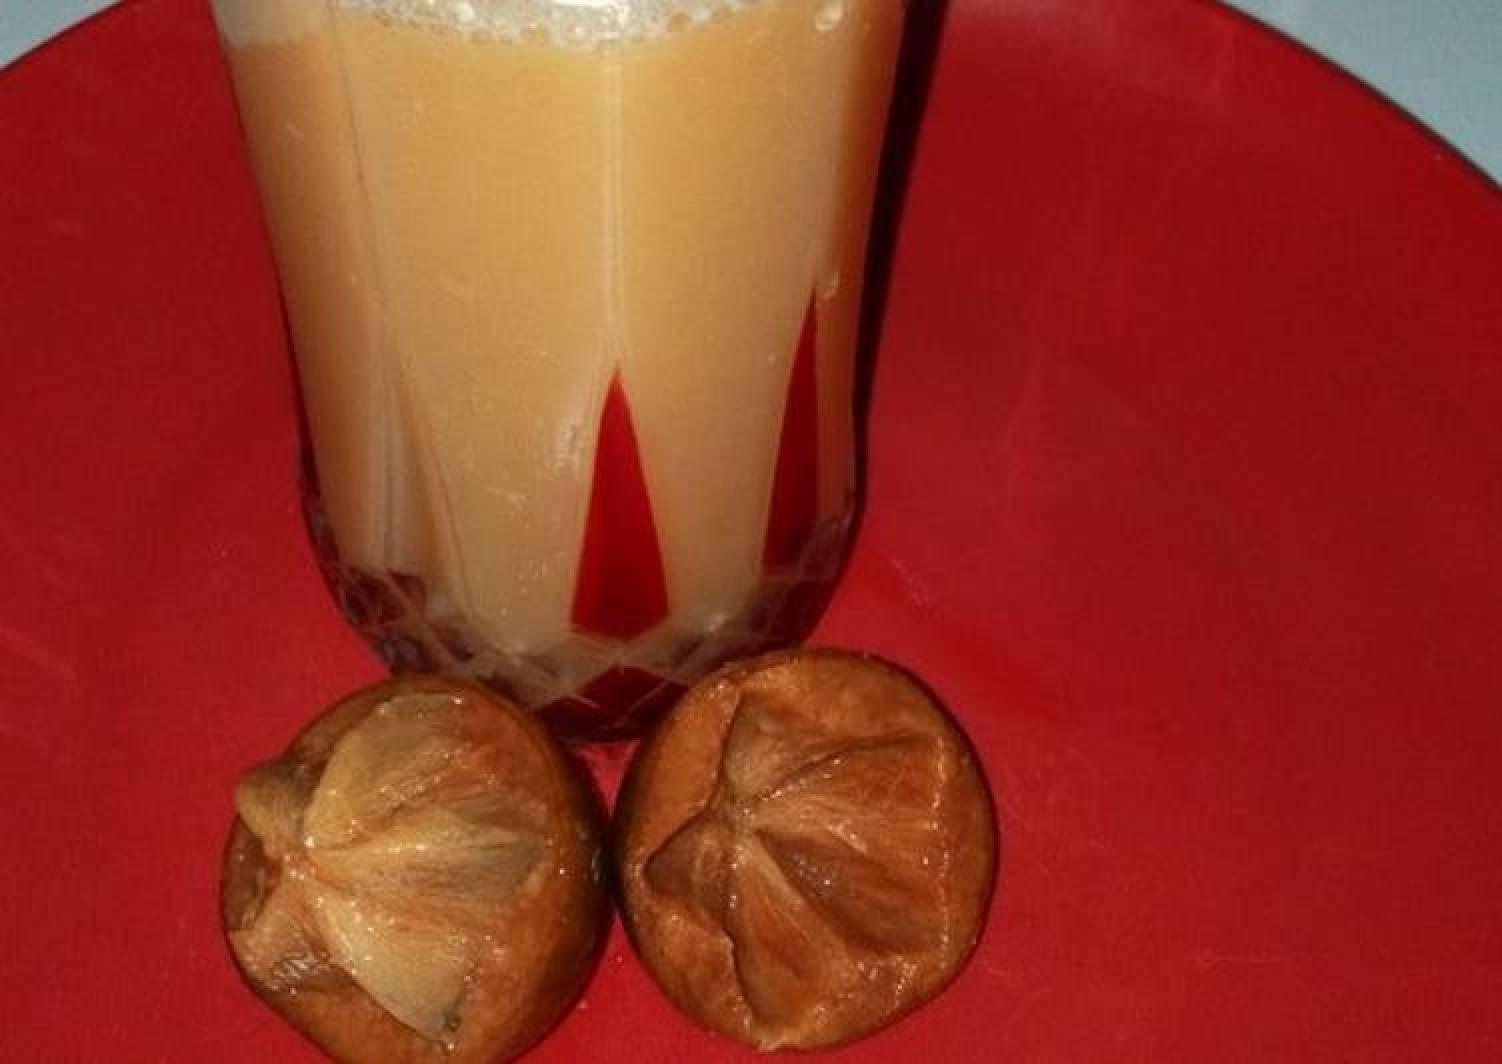 African star friut juice (agbalumo)